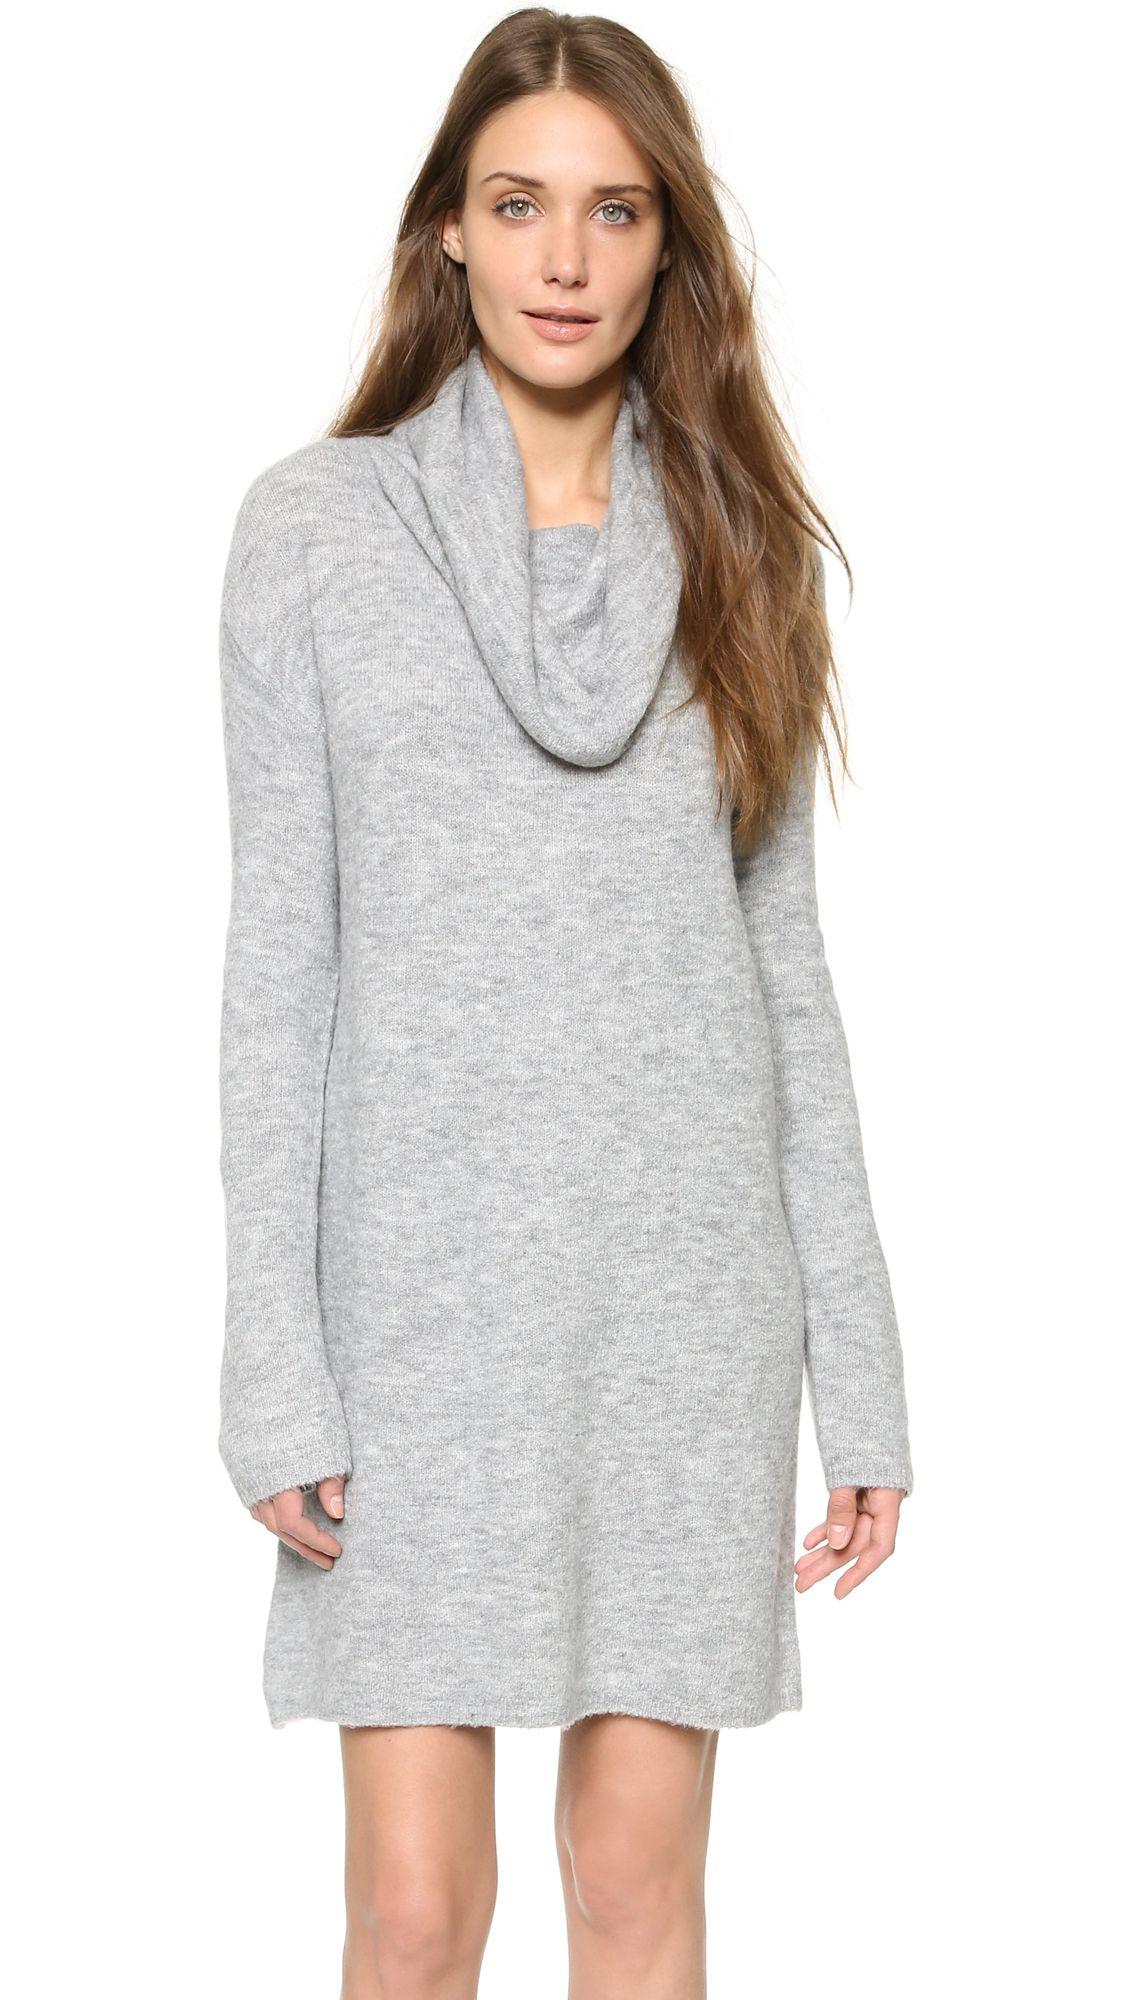 Long Sleeve Oversized Sweater Dress | LongSleeve Dress | Pinterest